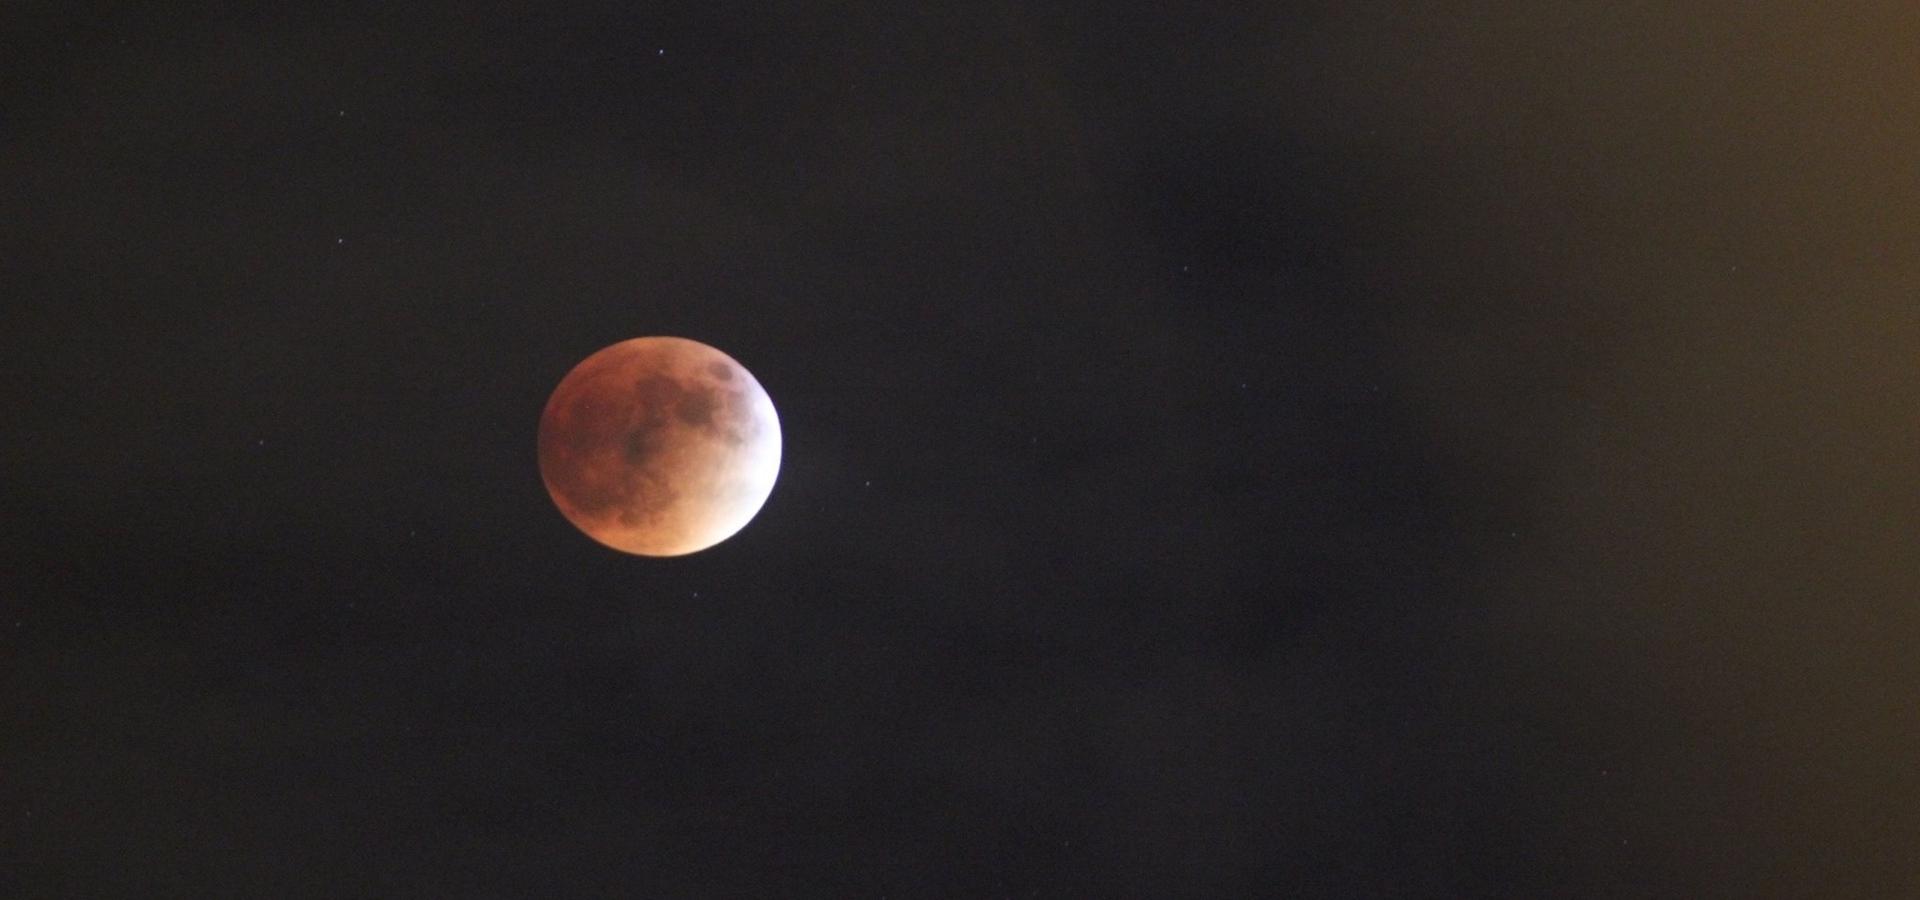 Photo of reddish moon in a black sky.